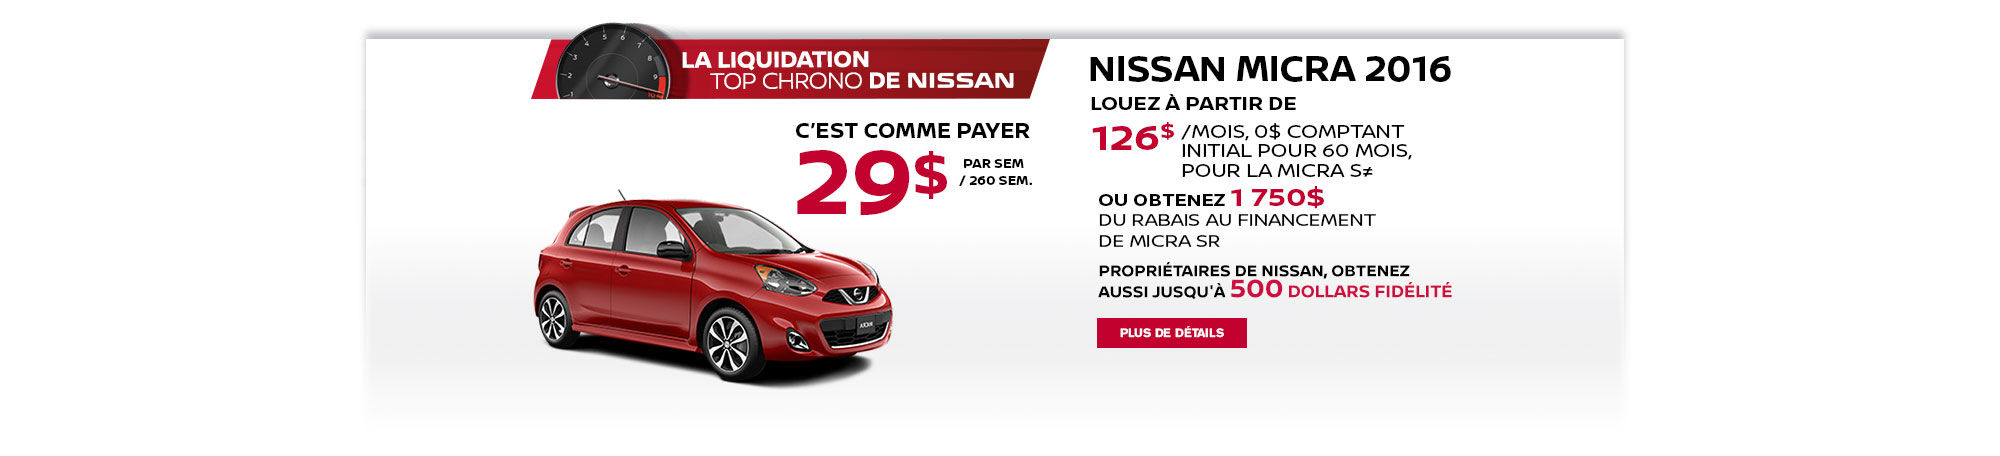 La liquidation top chrono de Nissan - Micra